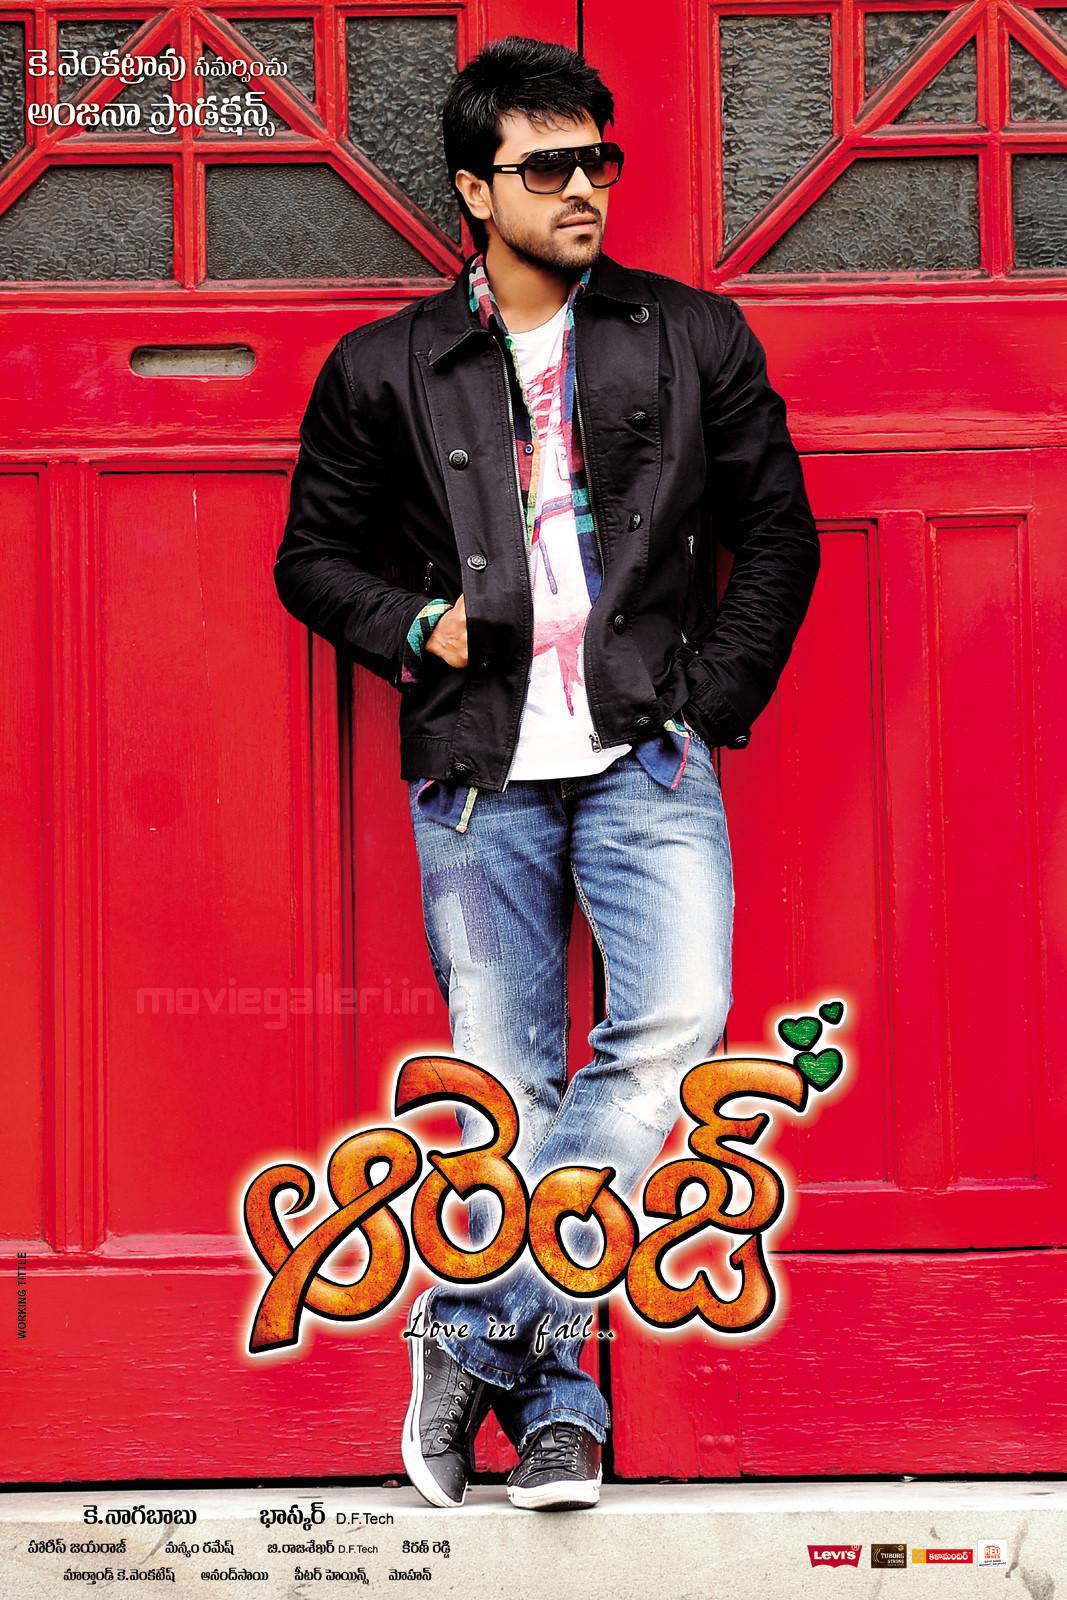 Cute Genelia D Souza Wallpapers Orange Movie Hd Wallpapers Orange Movie Widescreen